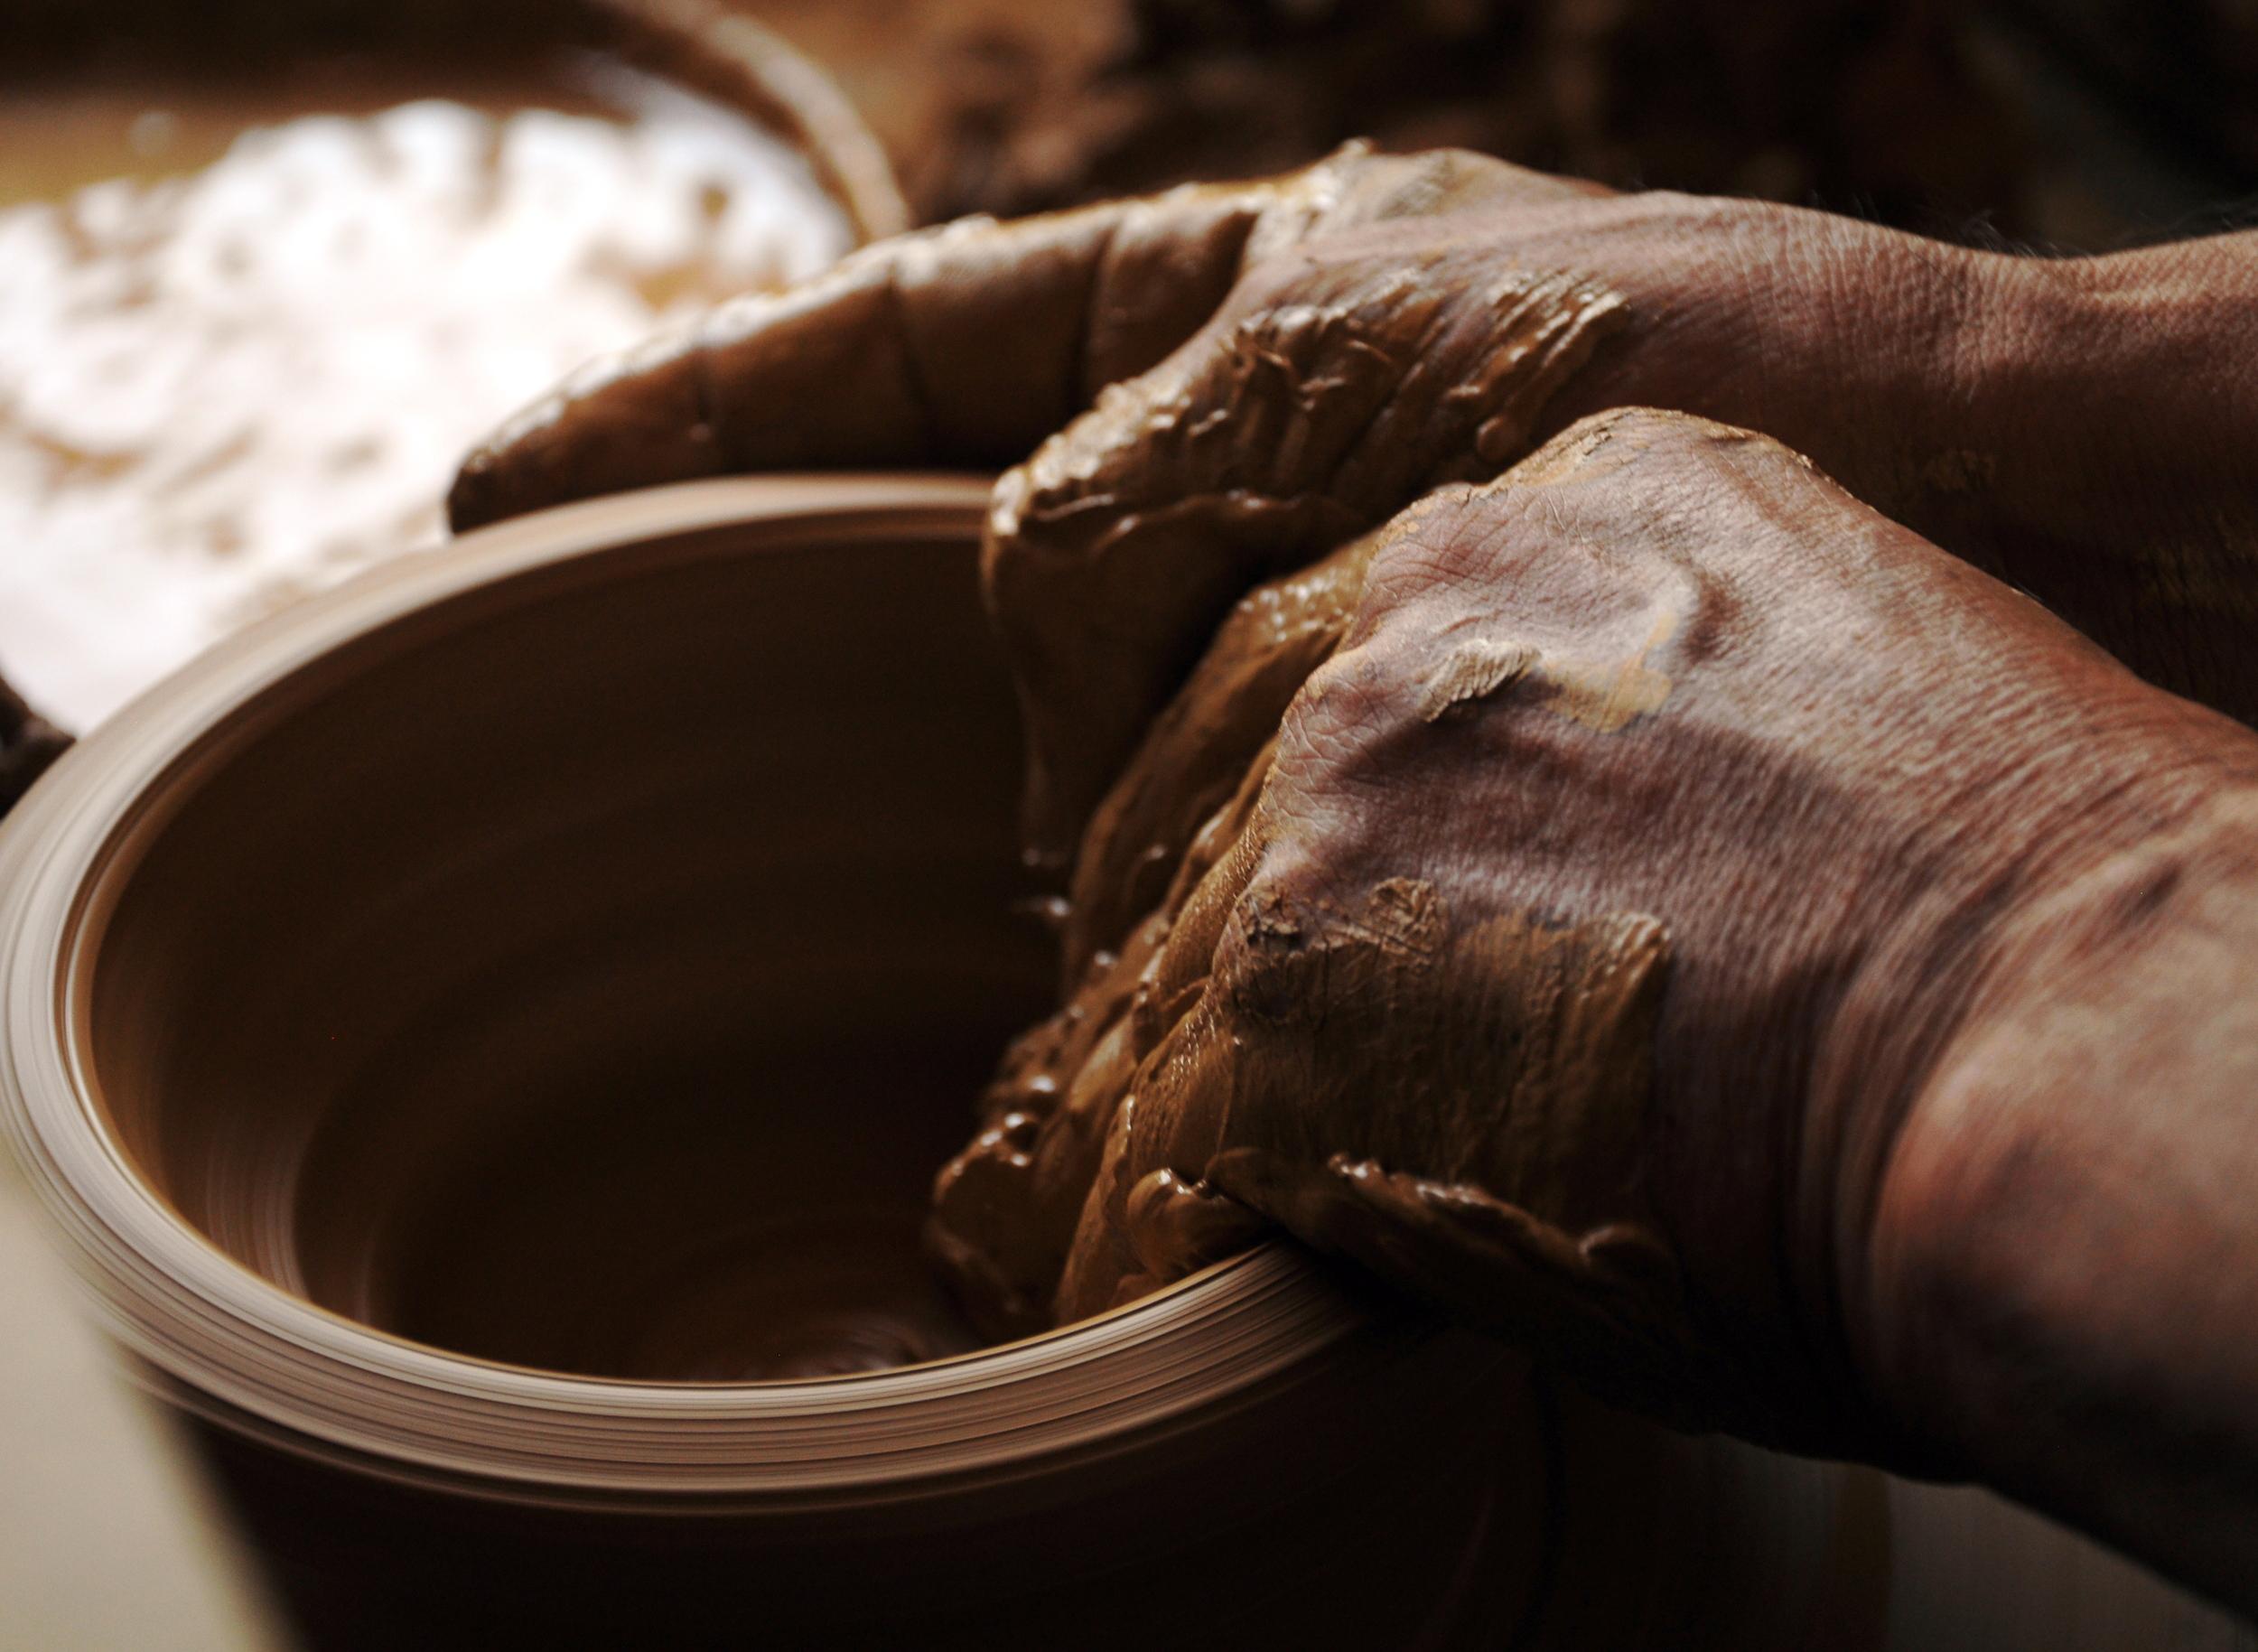 A Potter's Hands in Bilecik